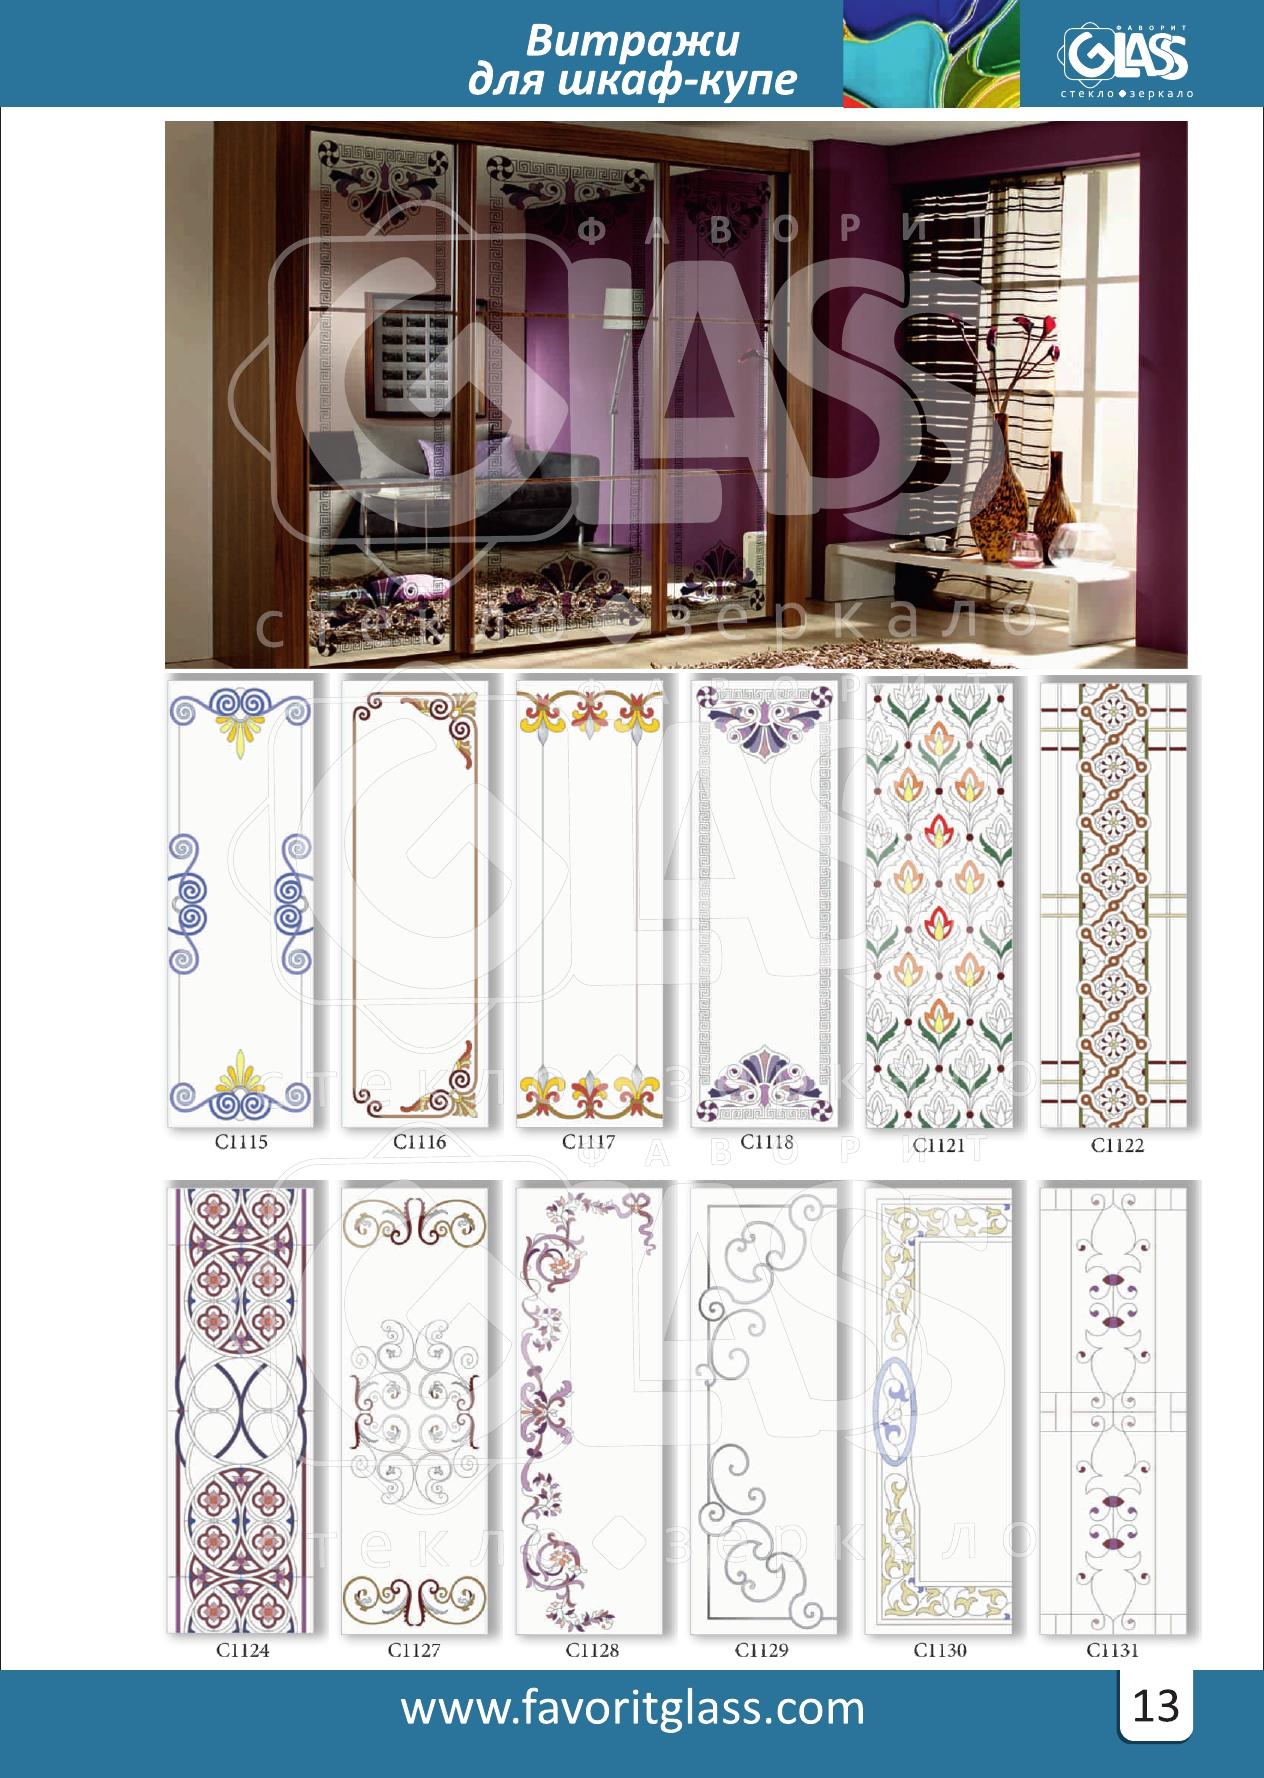 Glass (favorit)  vitrage_000014.jpg